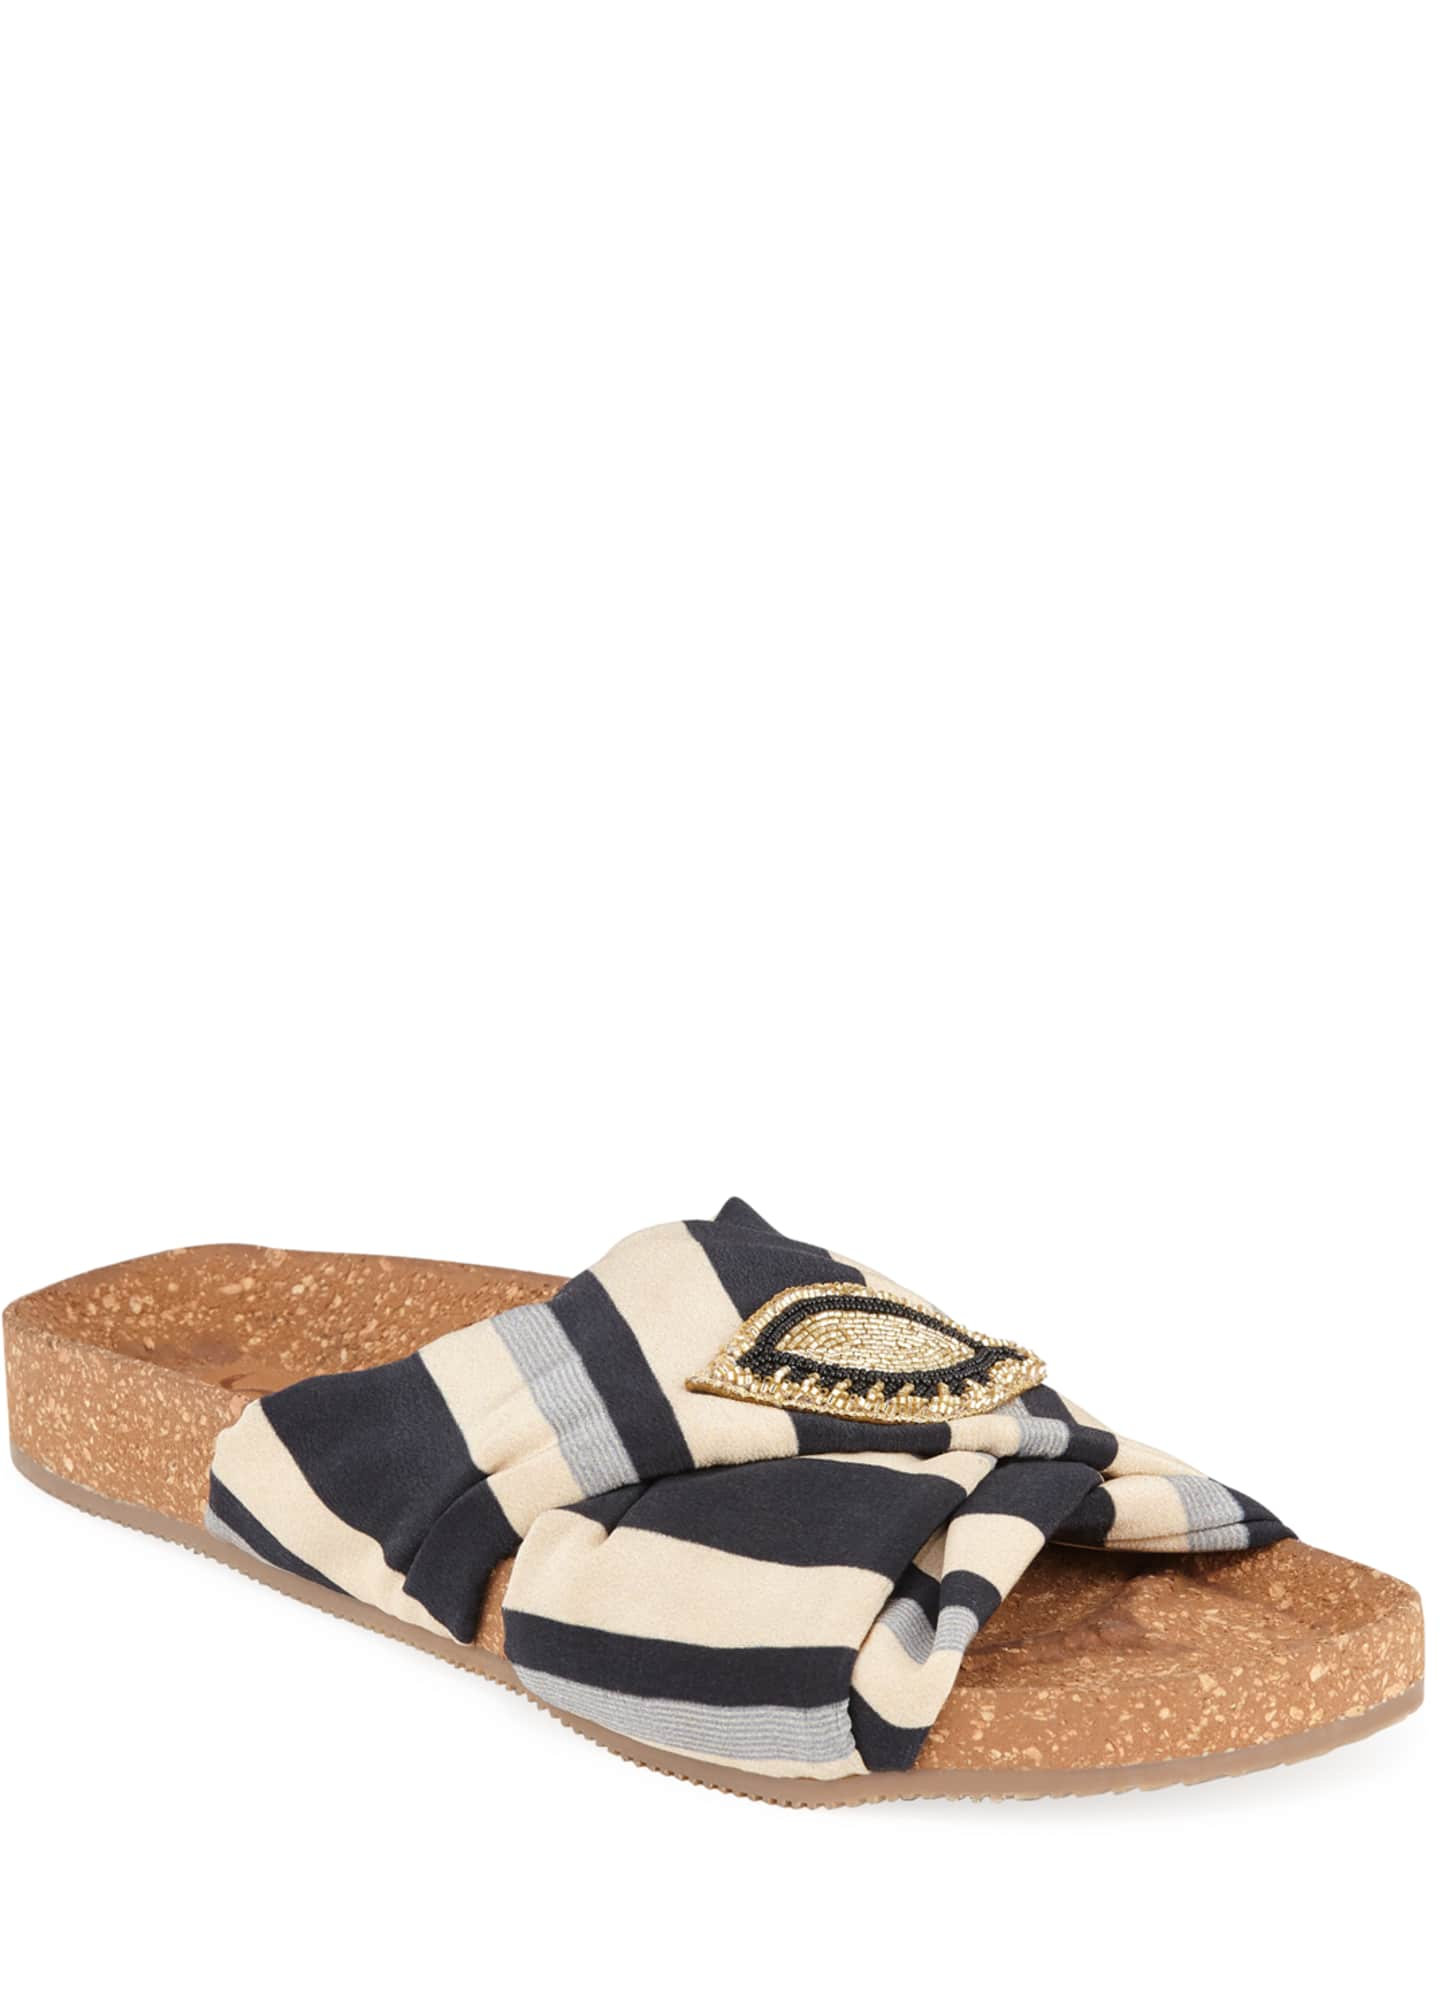 Figue Suki Beaded Silk Slide Sandals